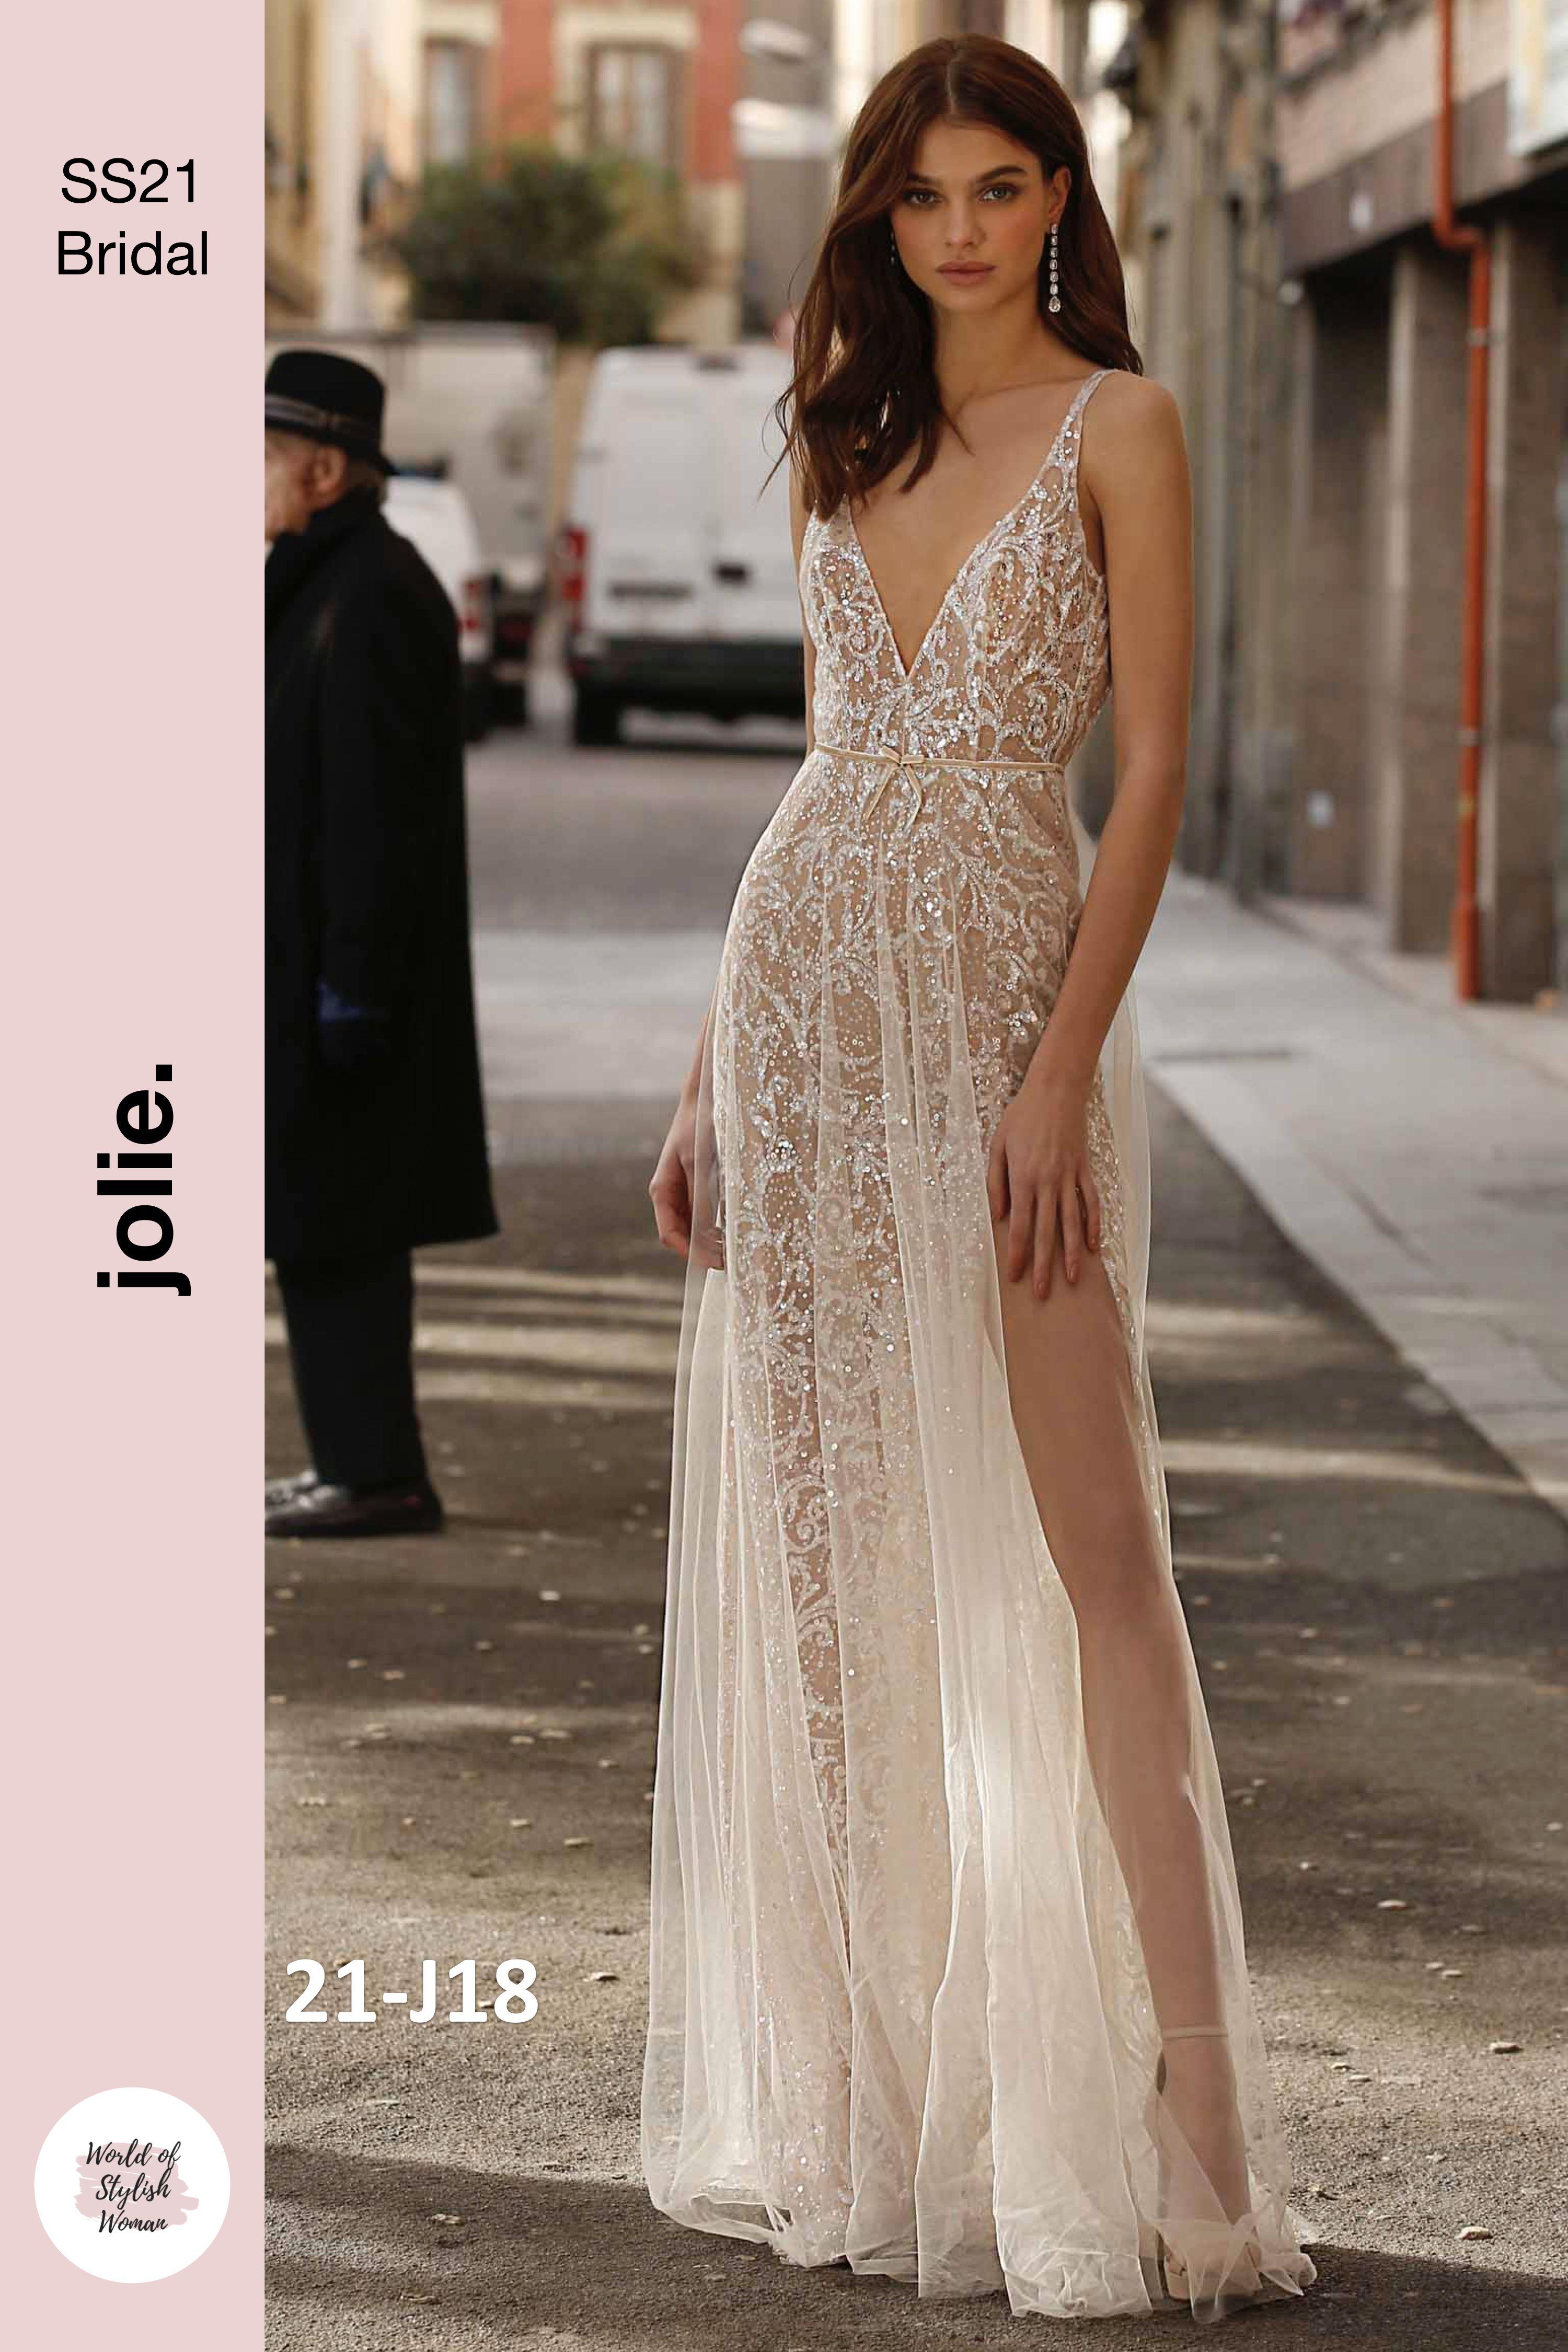 http://www.torontodresses.com/images/brides/mylady11/Lady